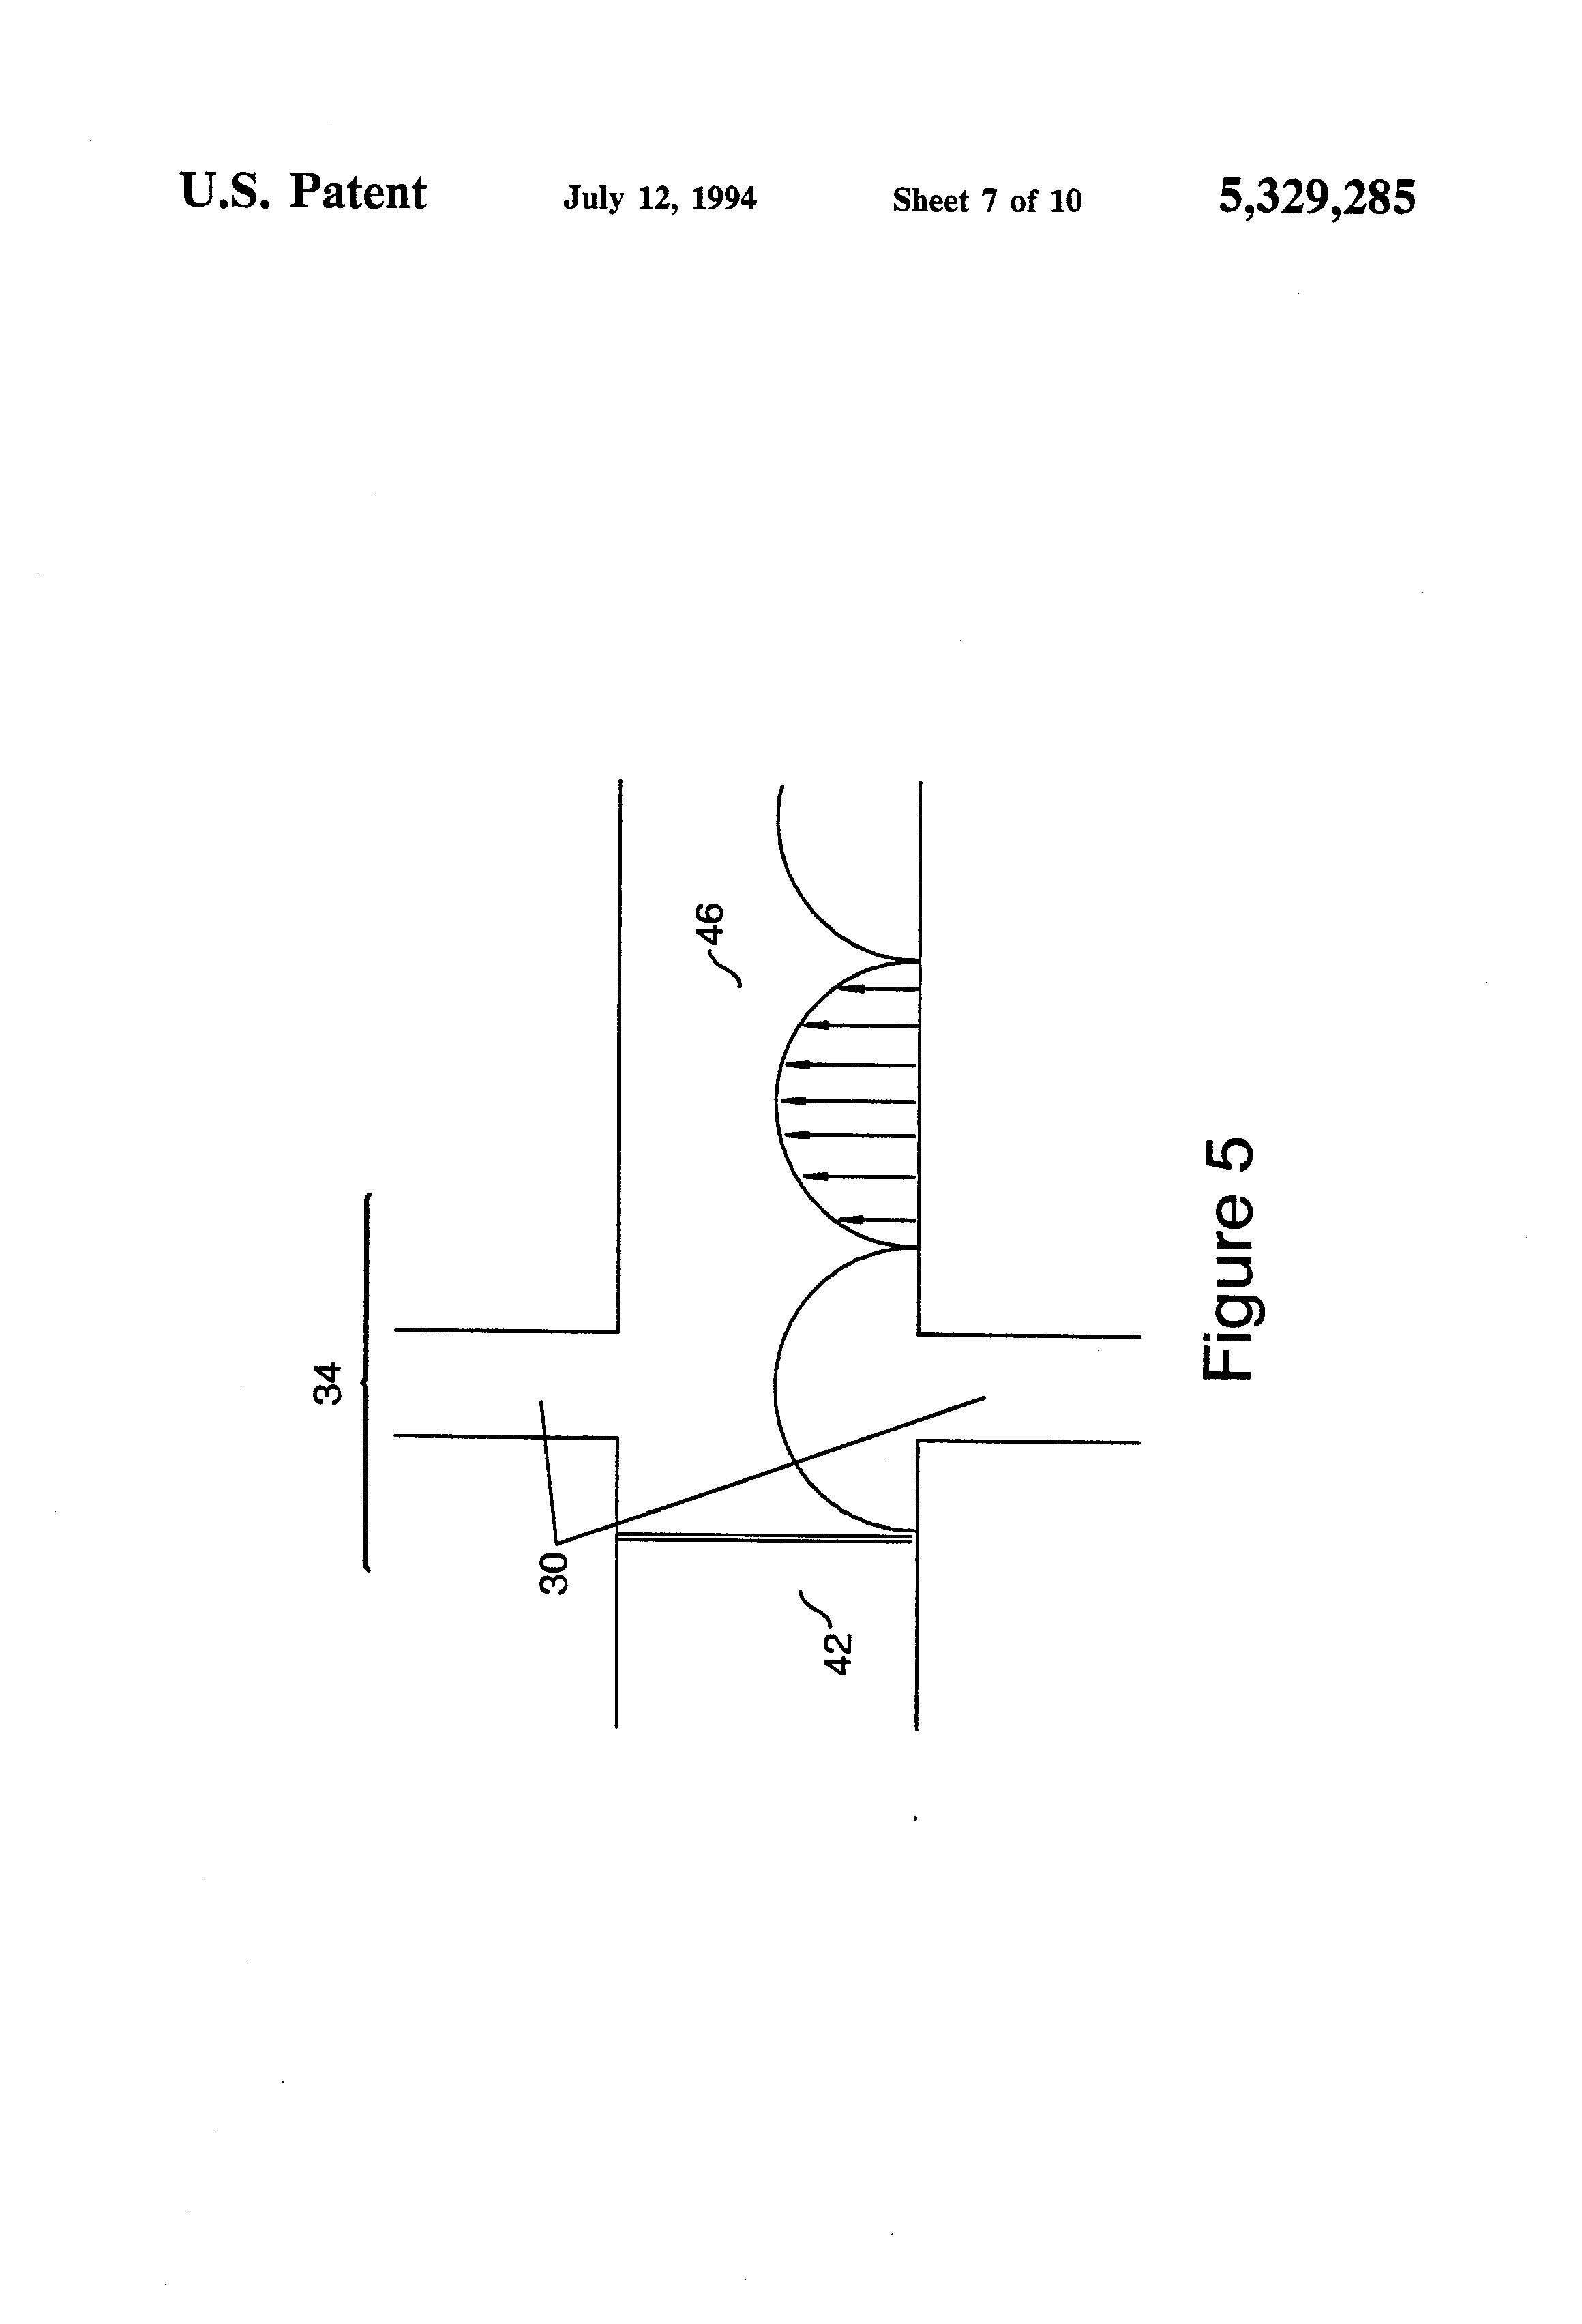 US 5329285 A - Dually Polarized Monopulse Feed Using An Orthogonal